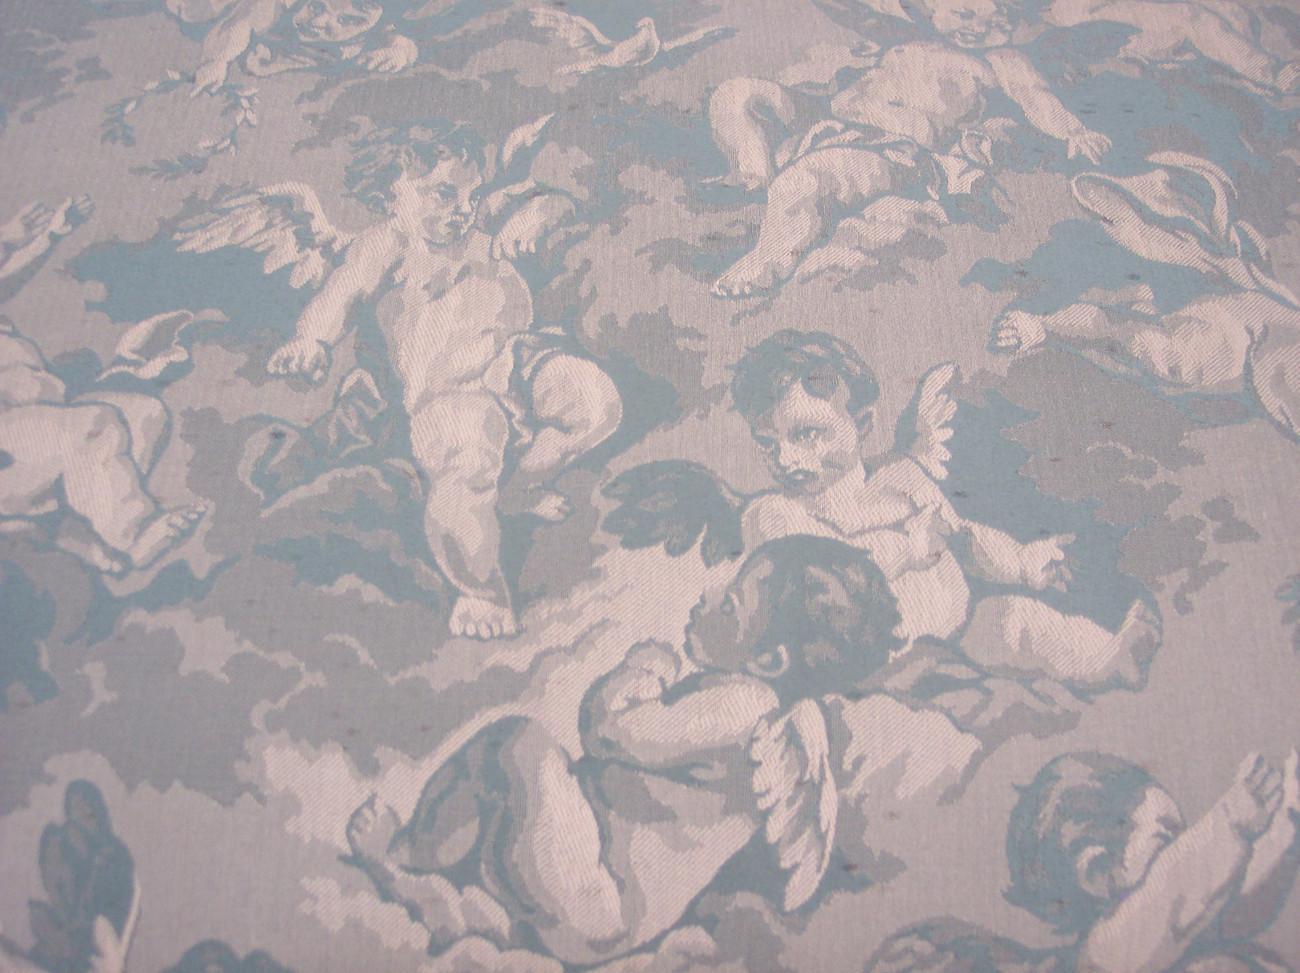 Walnut Cherub Print Cedar Chest or Blanket Chest by Lane